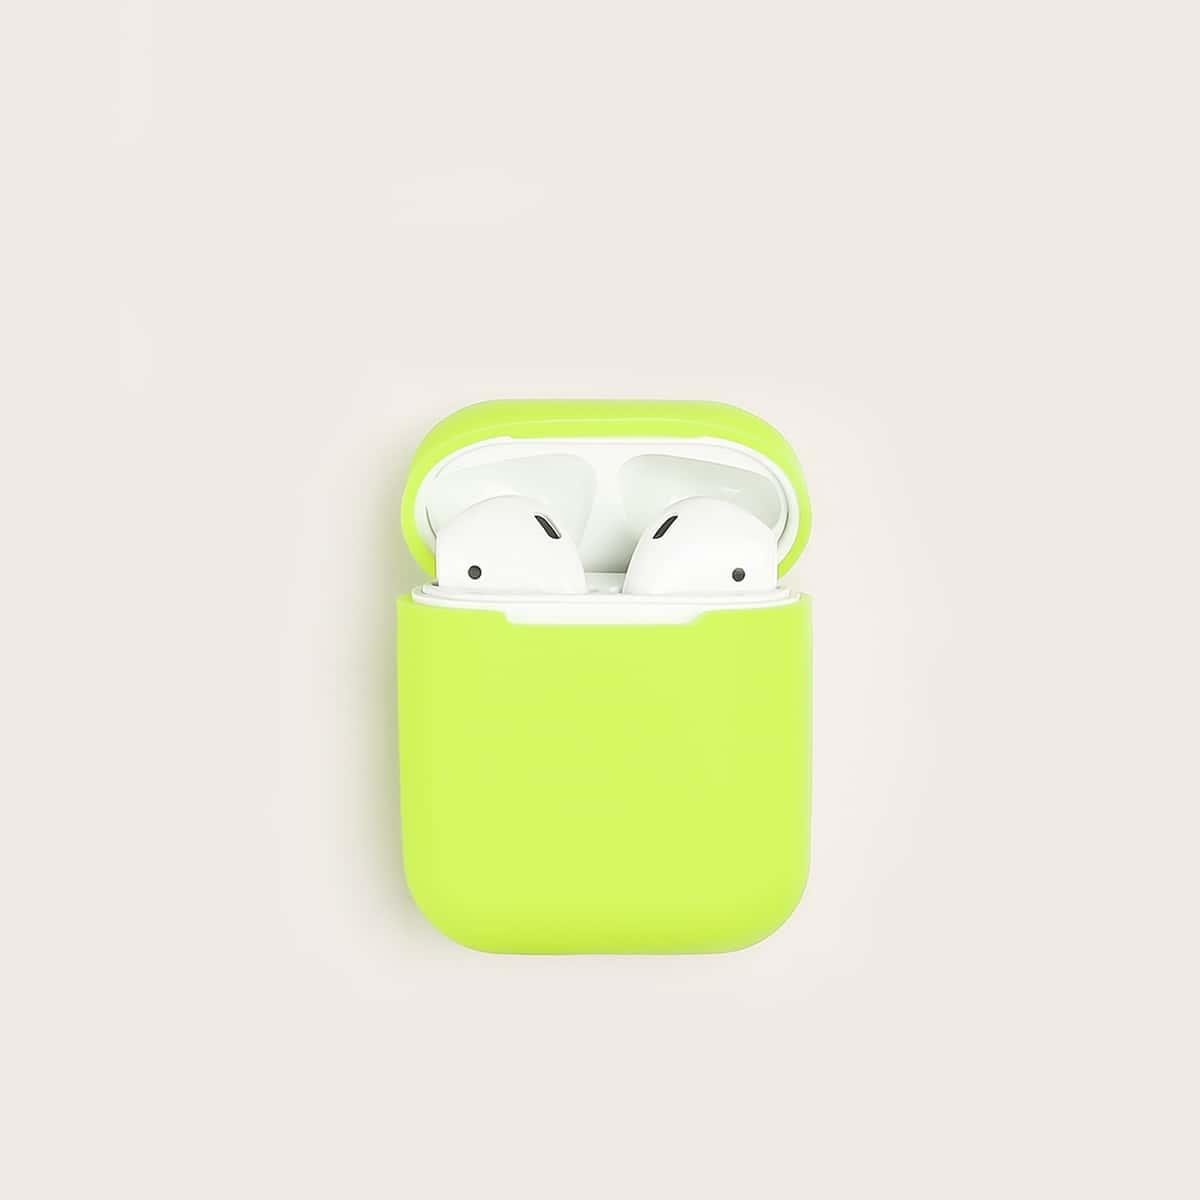 Neon groene hoofdtelefoonhoes